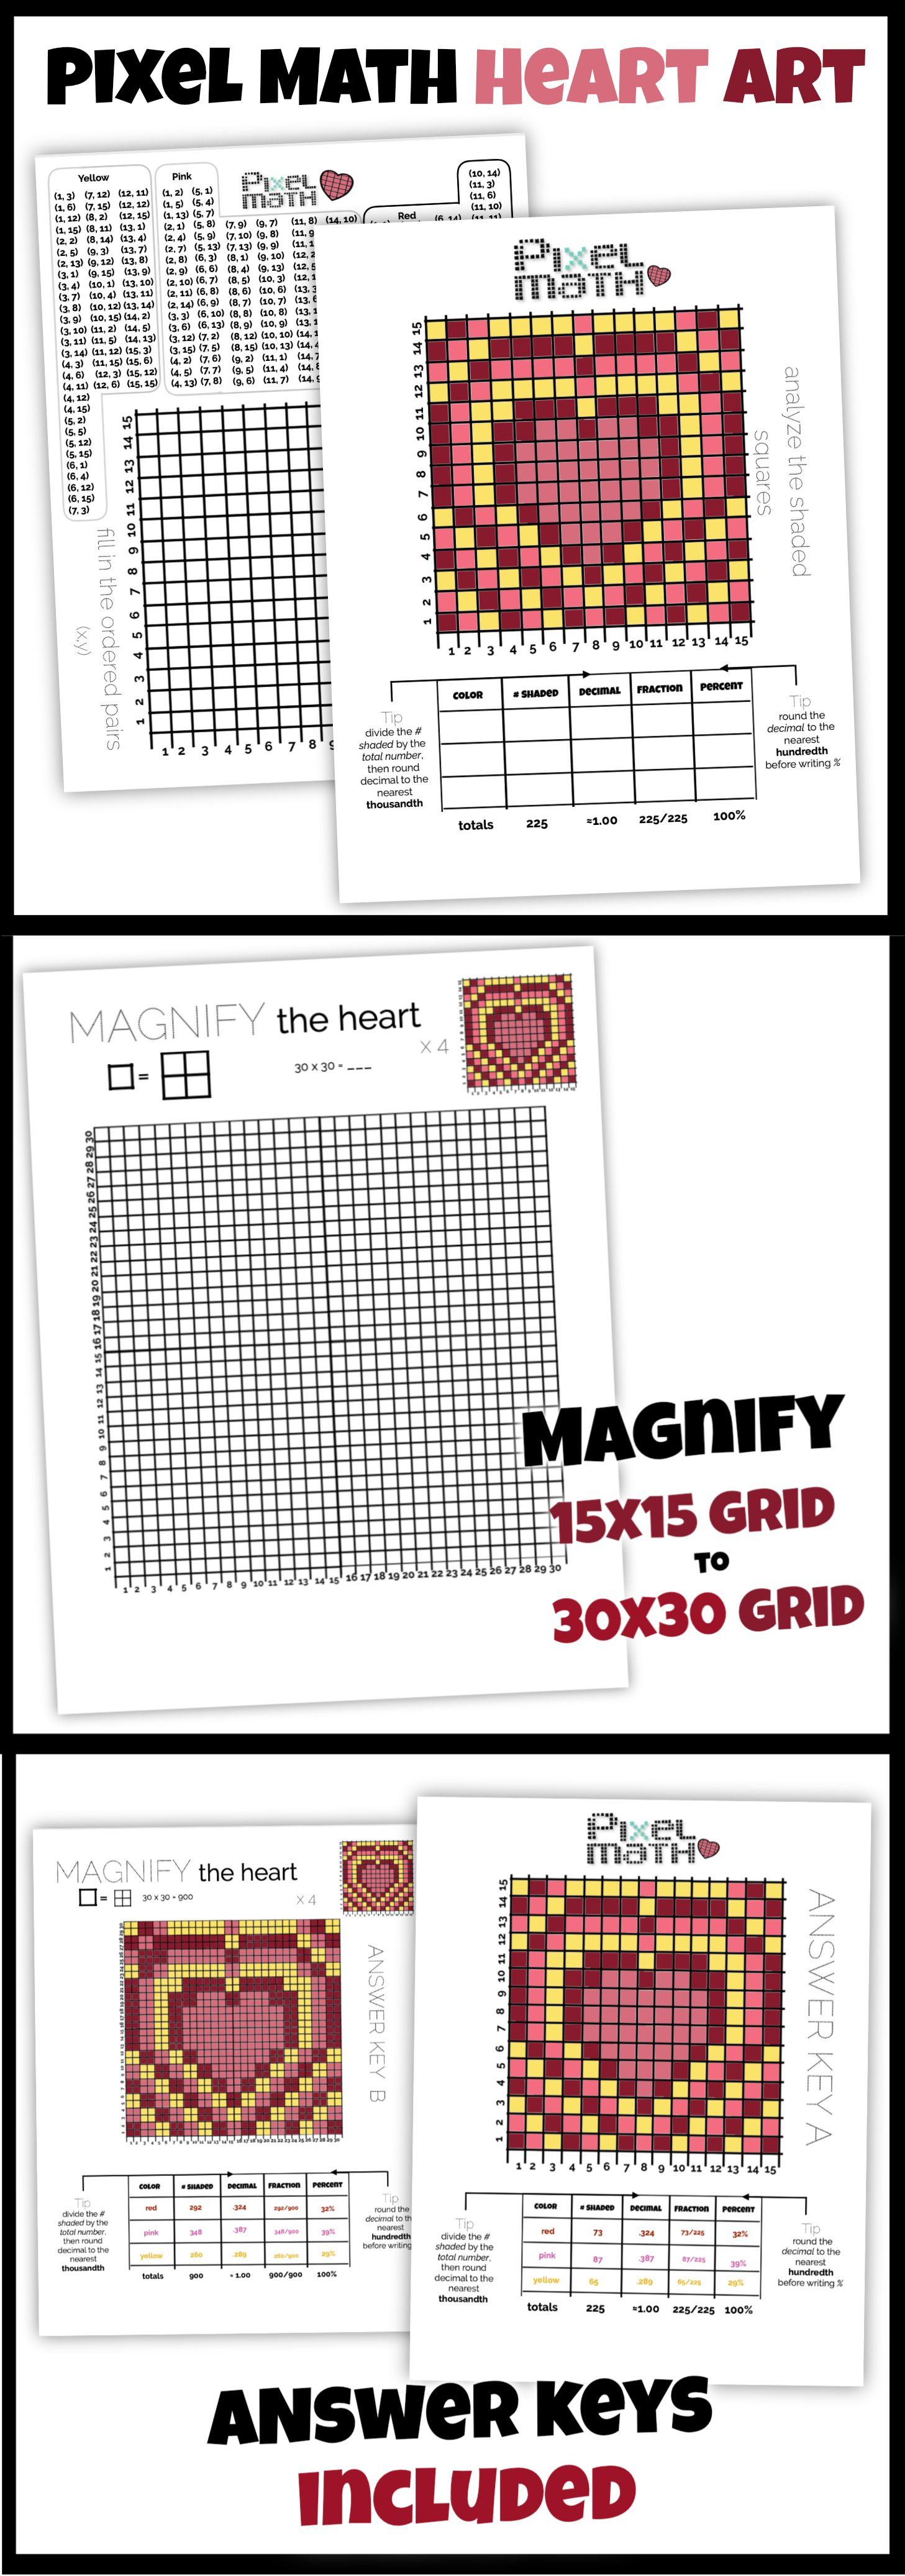 Heart Art Pixel Math Challenging And Creative Practice With Decimal Fraction Percent Math Challenge Math Heart Art [ 4147 x 1457 Pixel ]